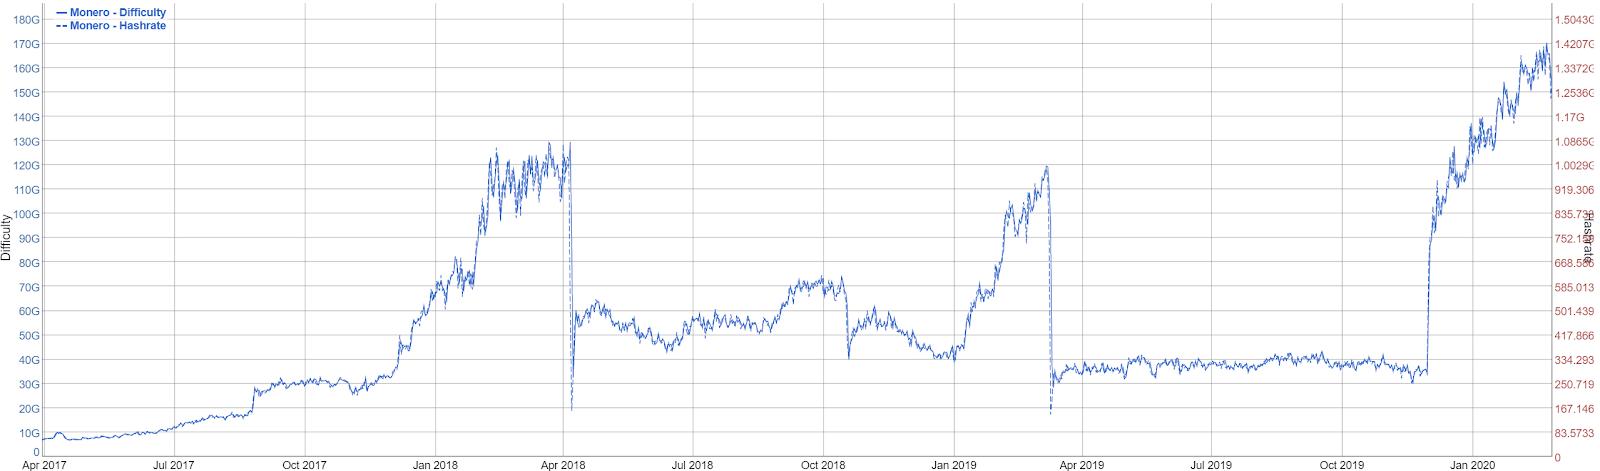 Monero Price Analysis 28 Feb 2020 (2)